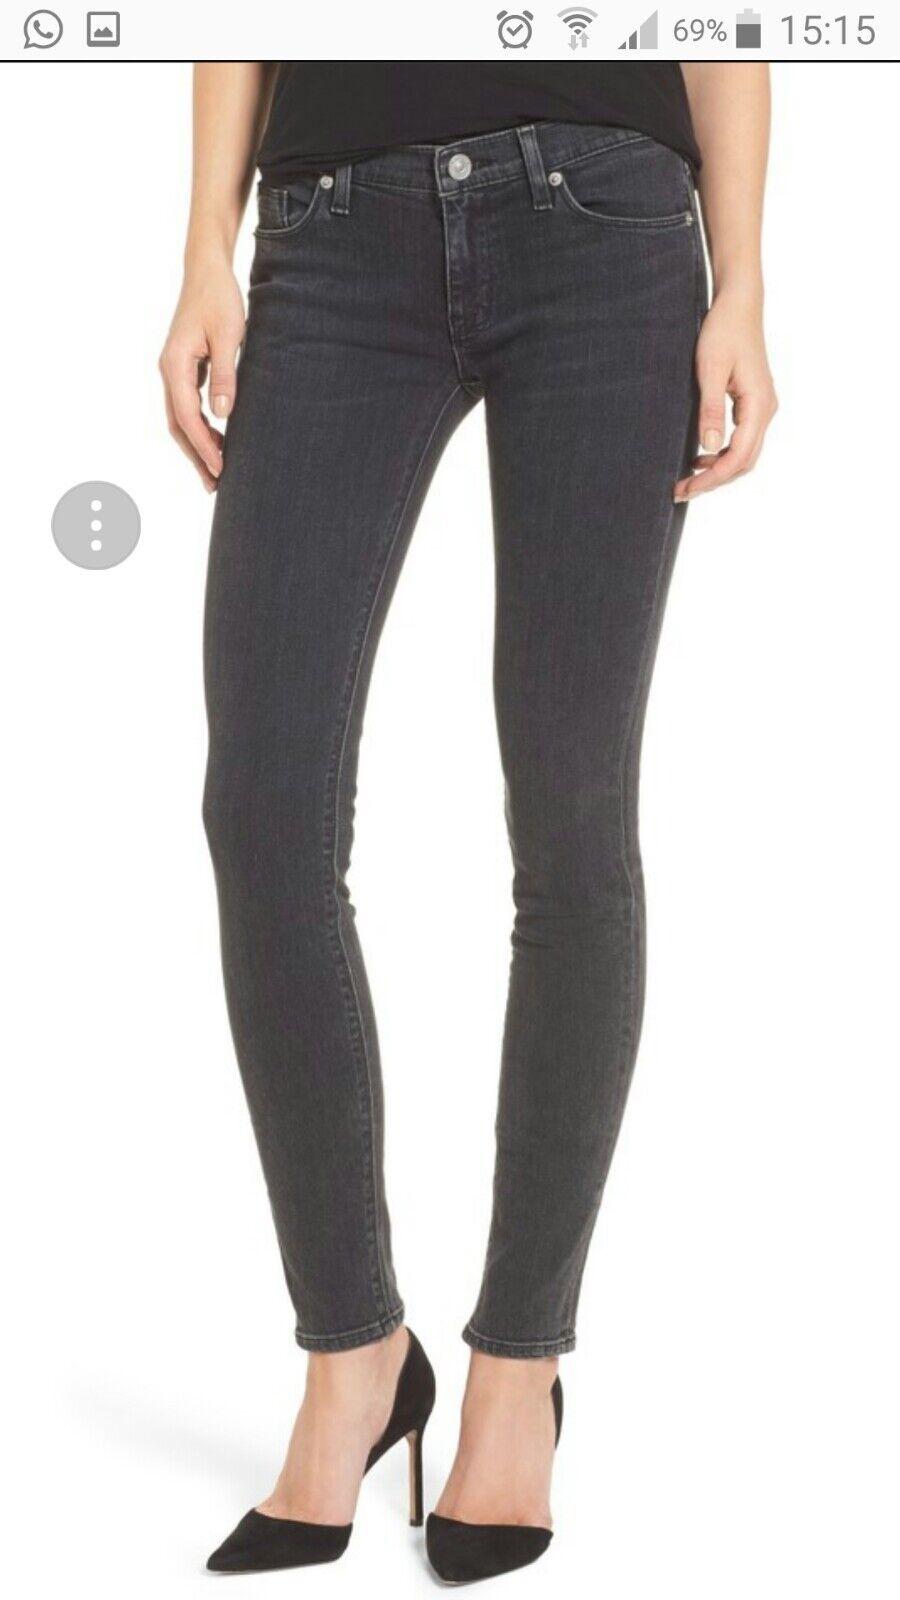 Hudson Jeans Krista NERO taglie disponibili 23 24 25 26 27 28 29